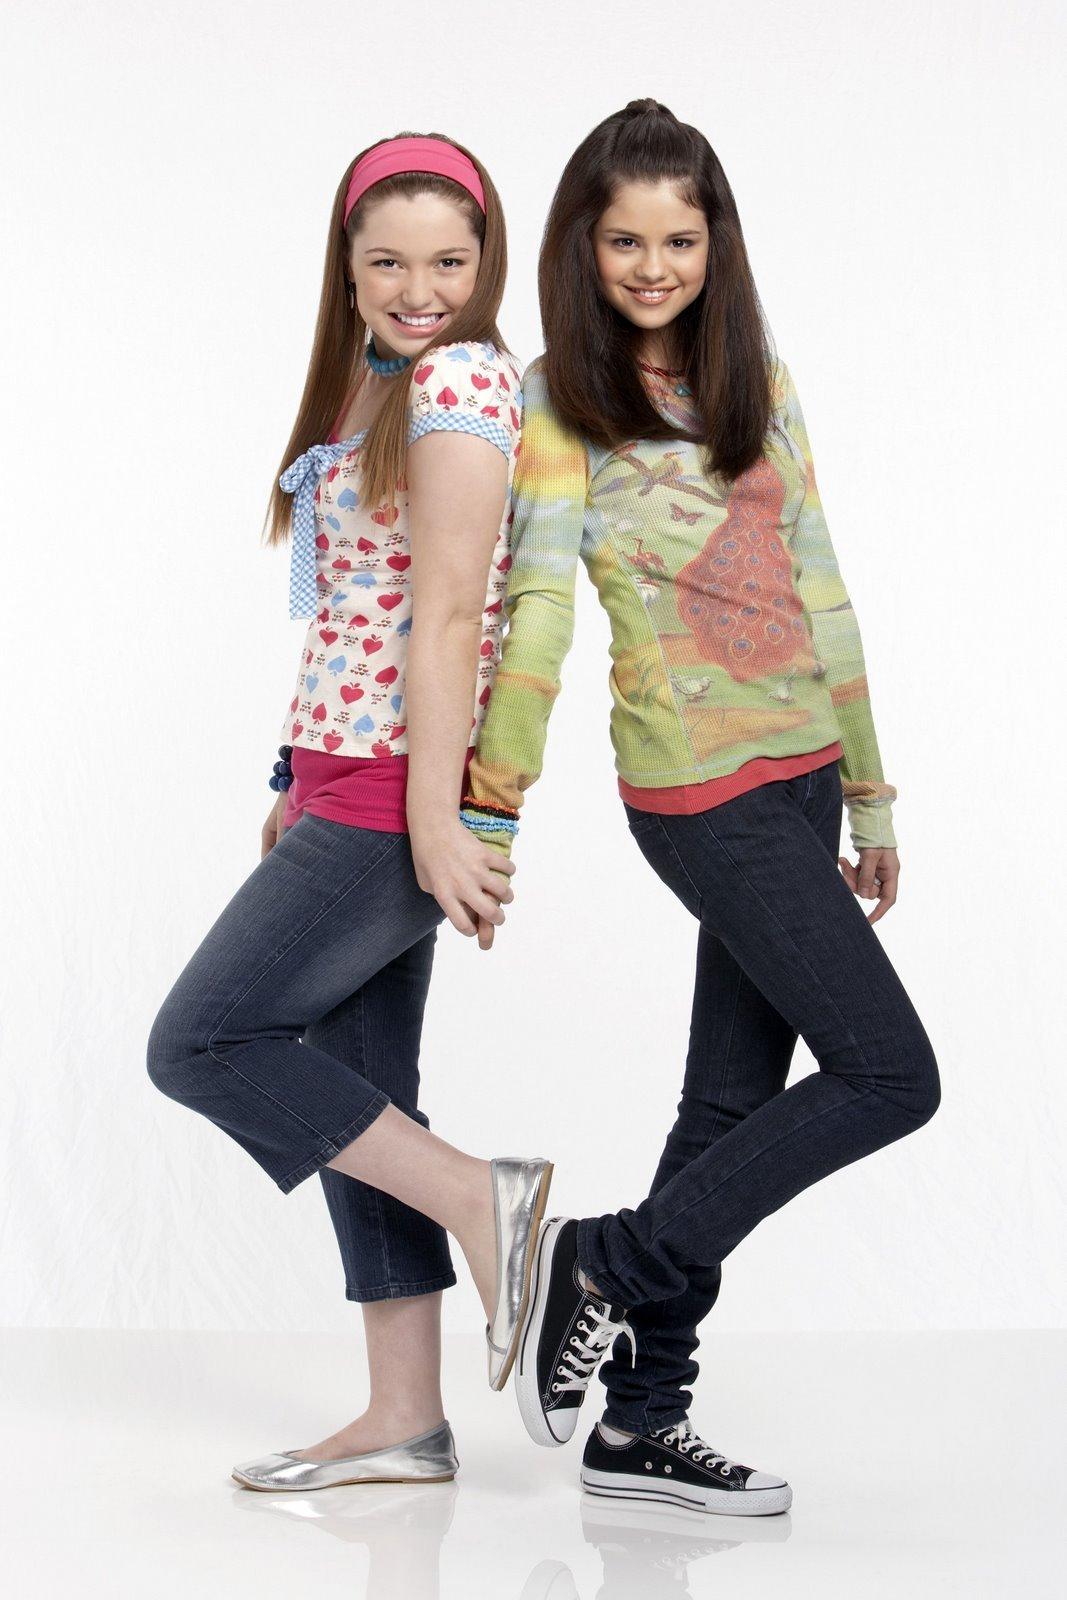 external image Selena-Gomez-and-Jennifer-Stone-celebs-6285687-1067-1600.jpg